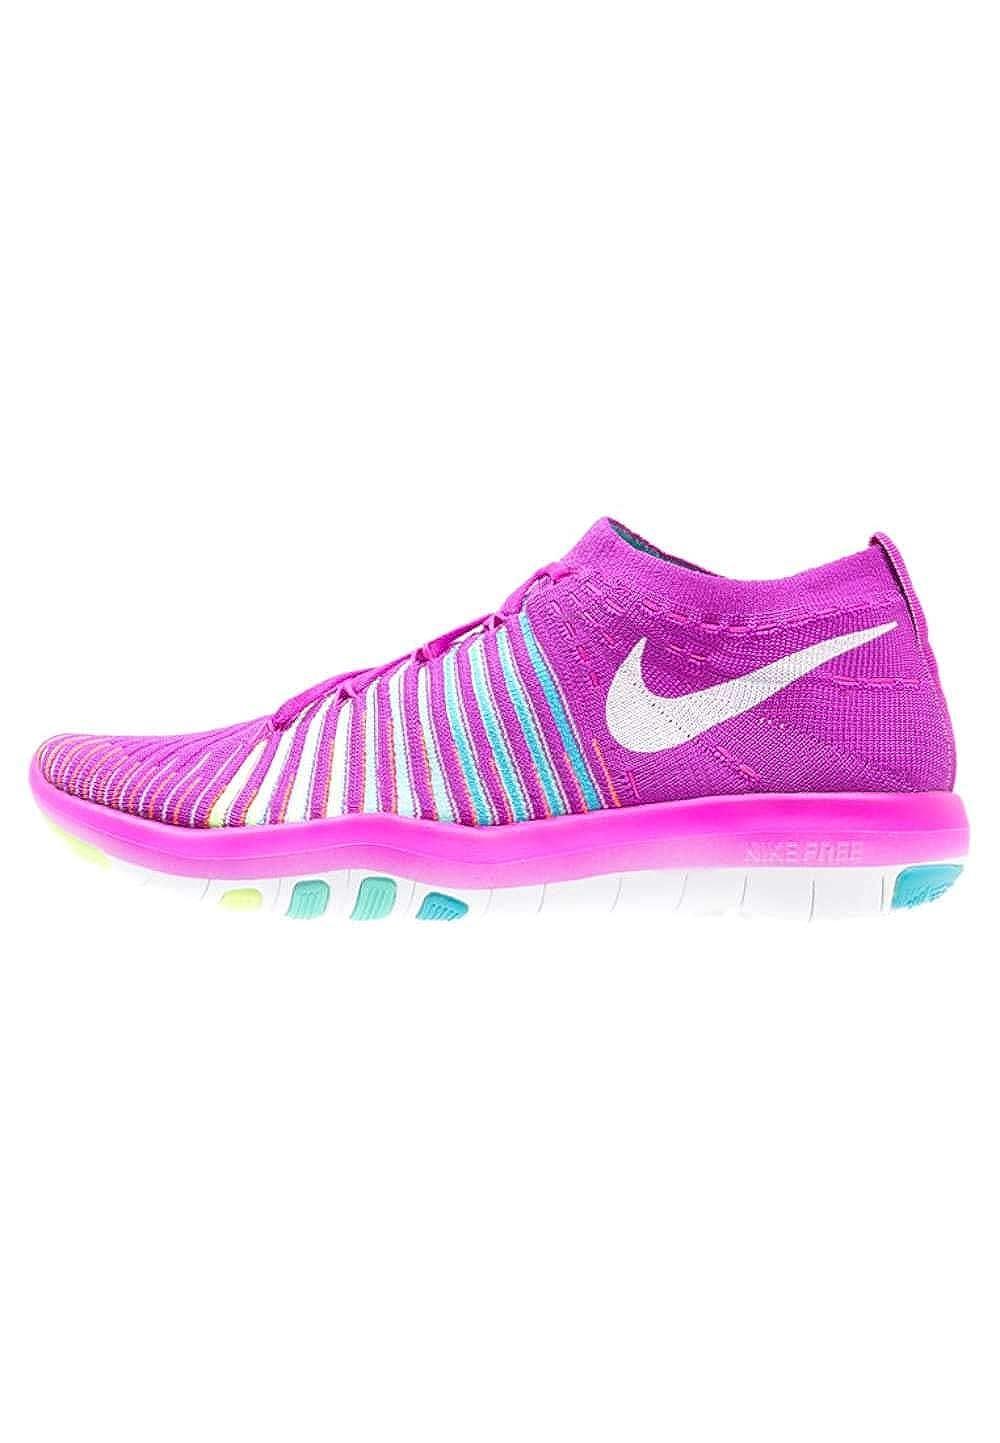 Nike Nike Nike Damen Wm Free Transform Flyknit Gymnastikschuhe 47b4b7